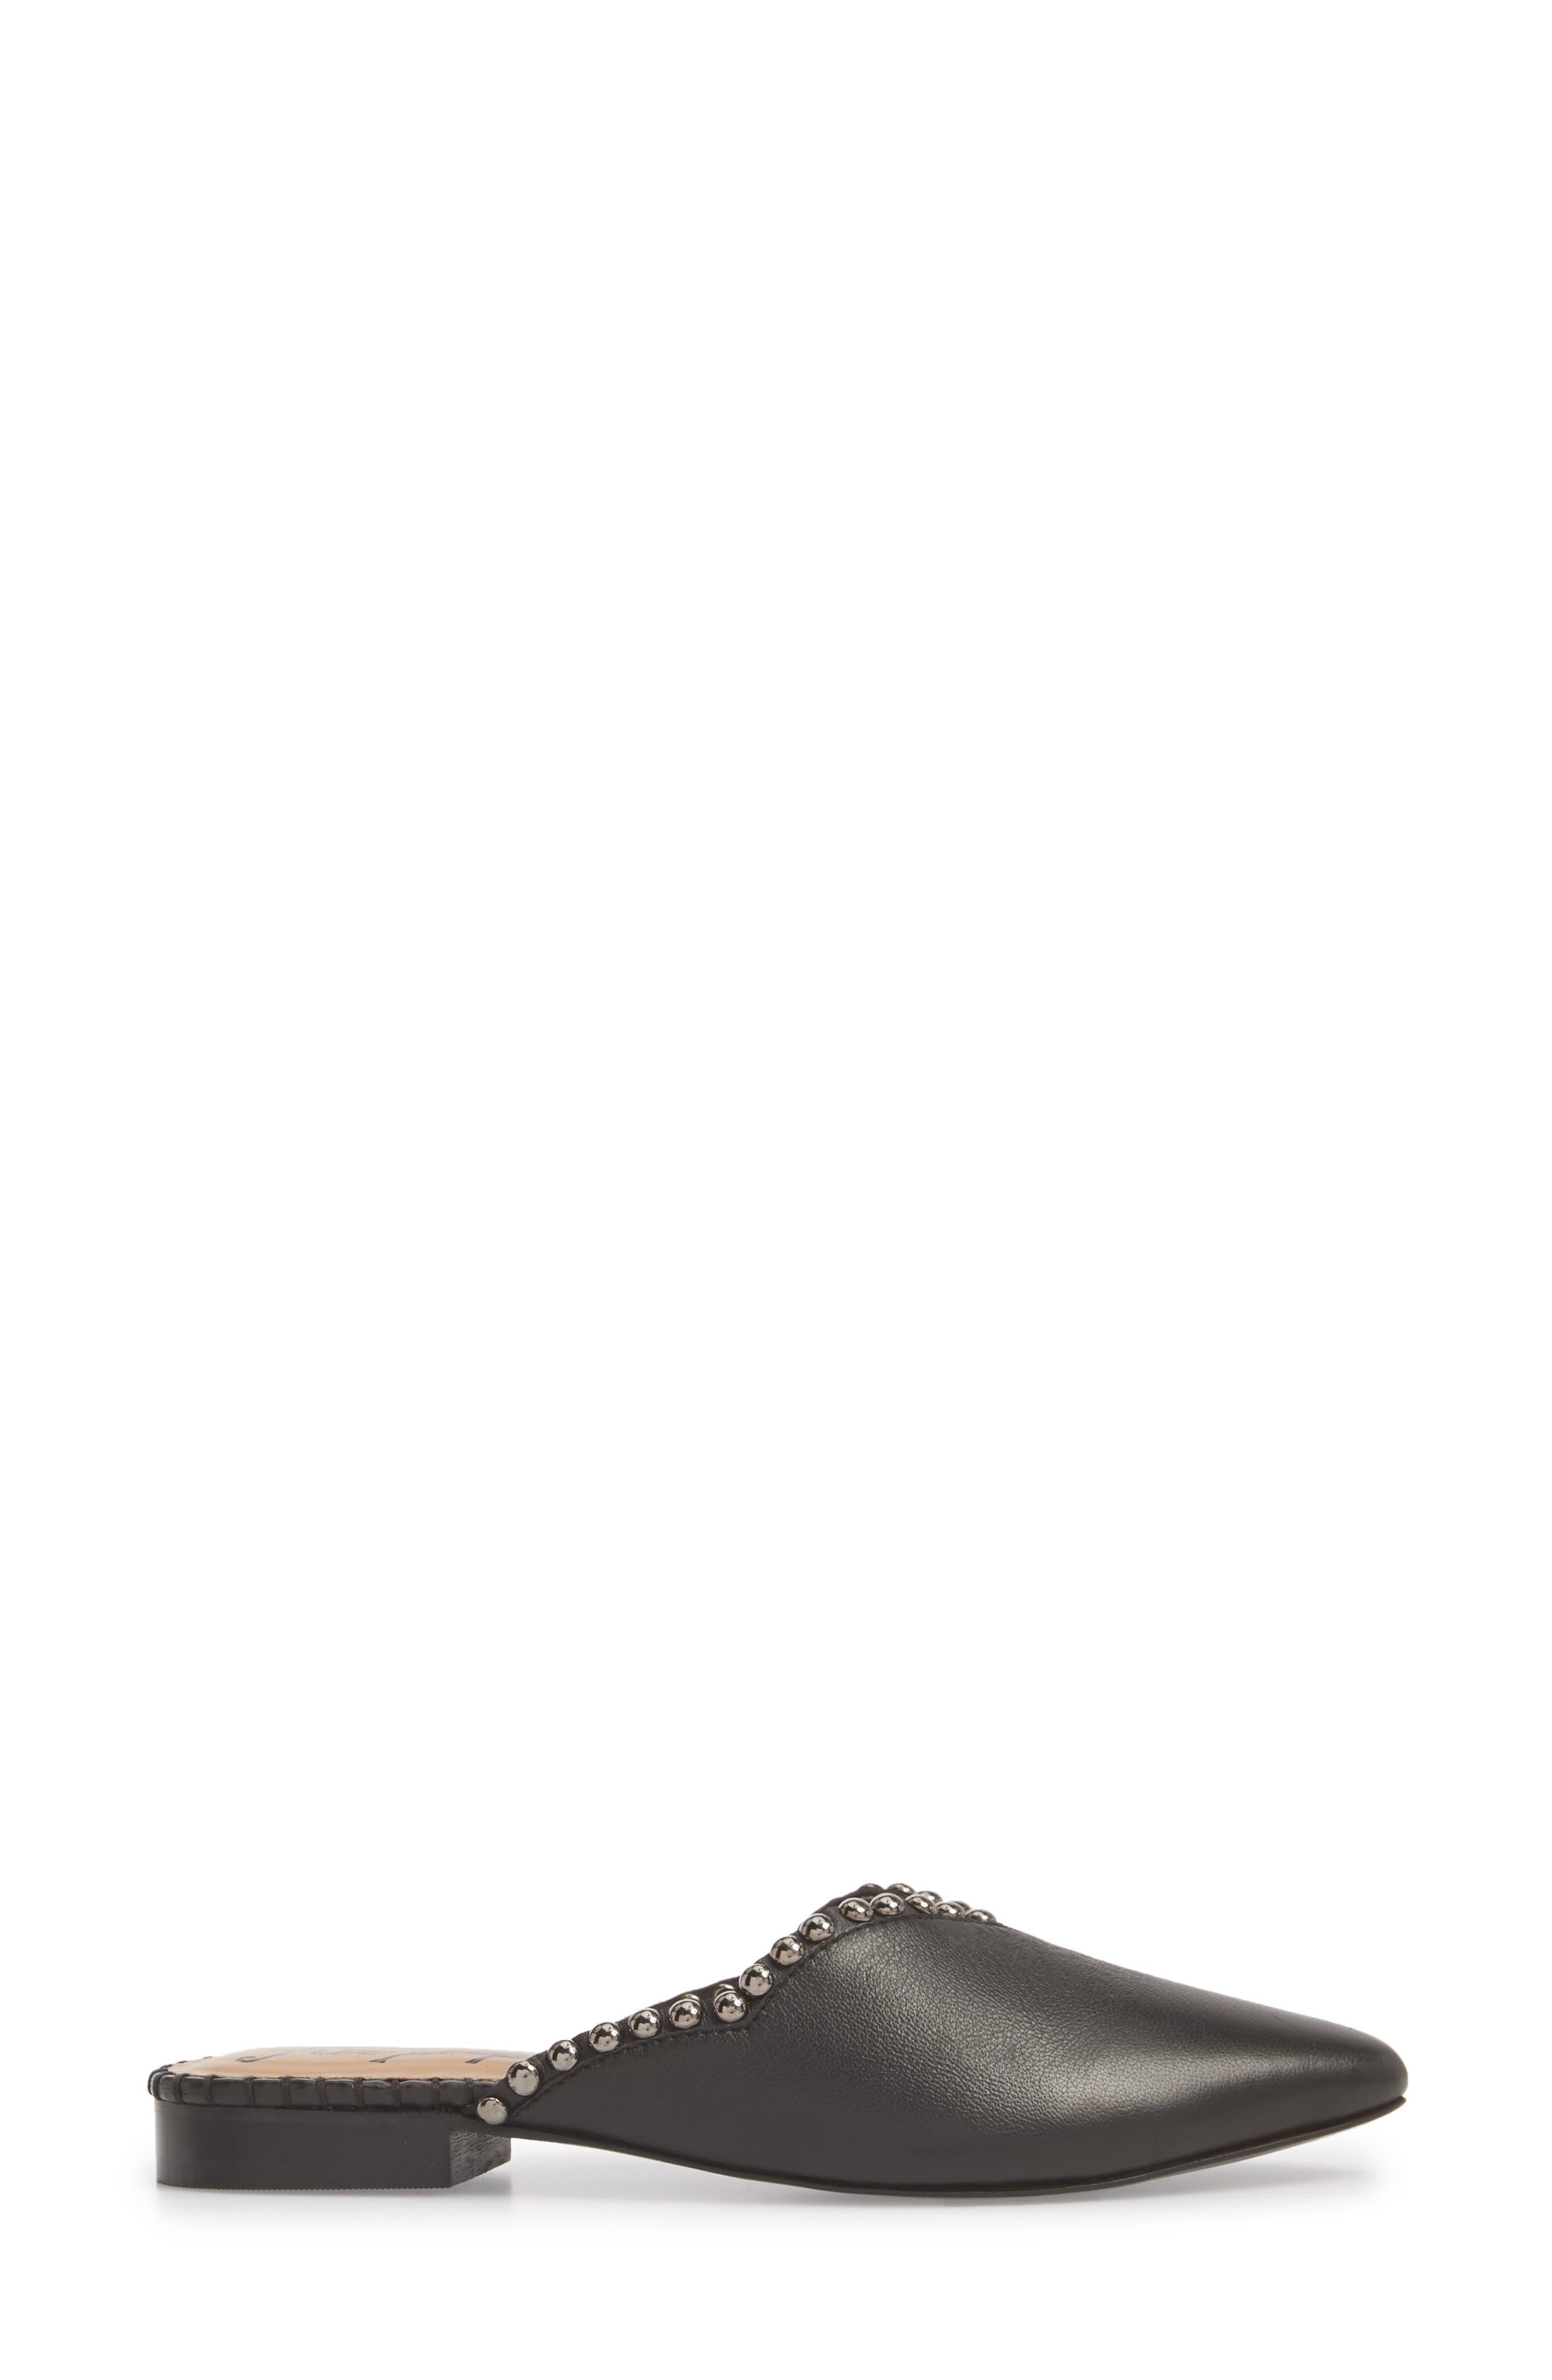 Newport Studded Mule,                             Alternate thumbnail 3, color,                             BLACK